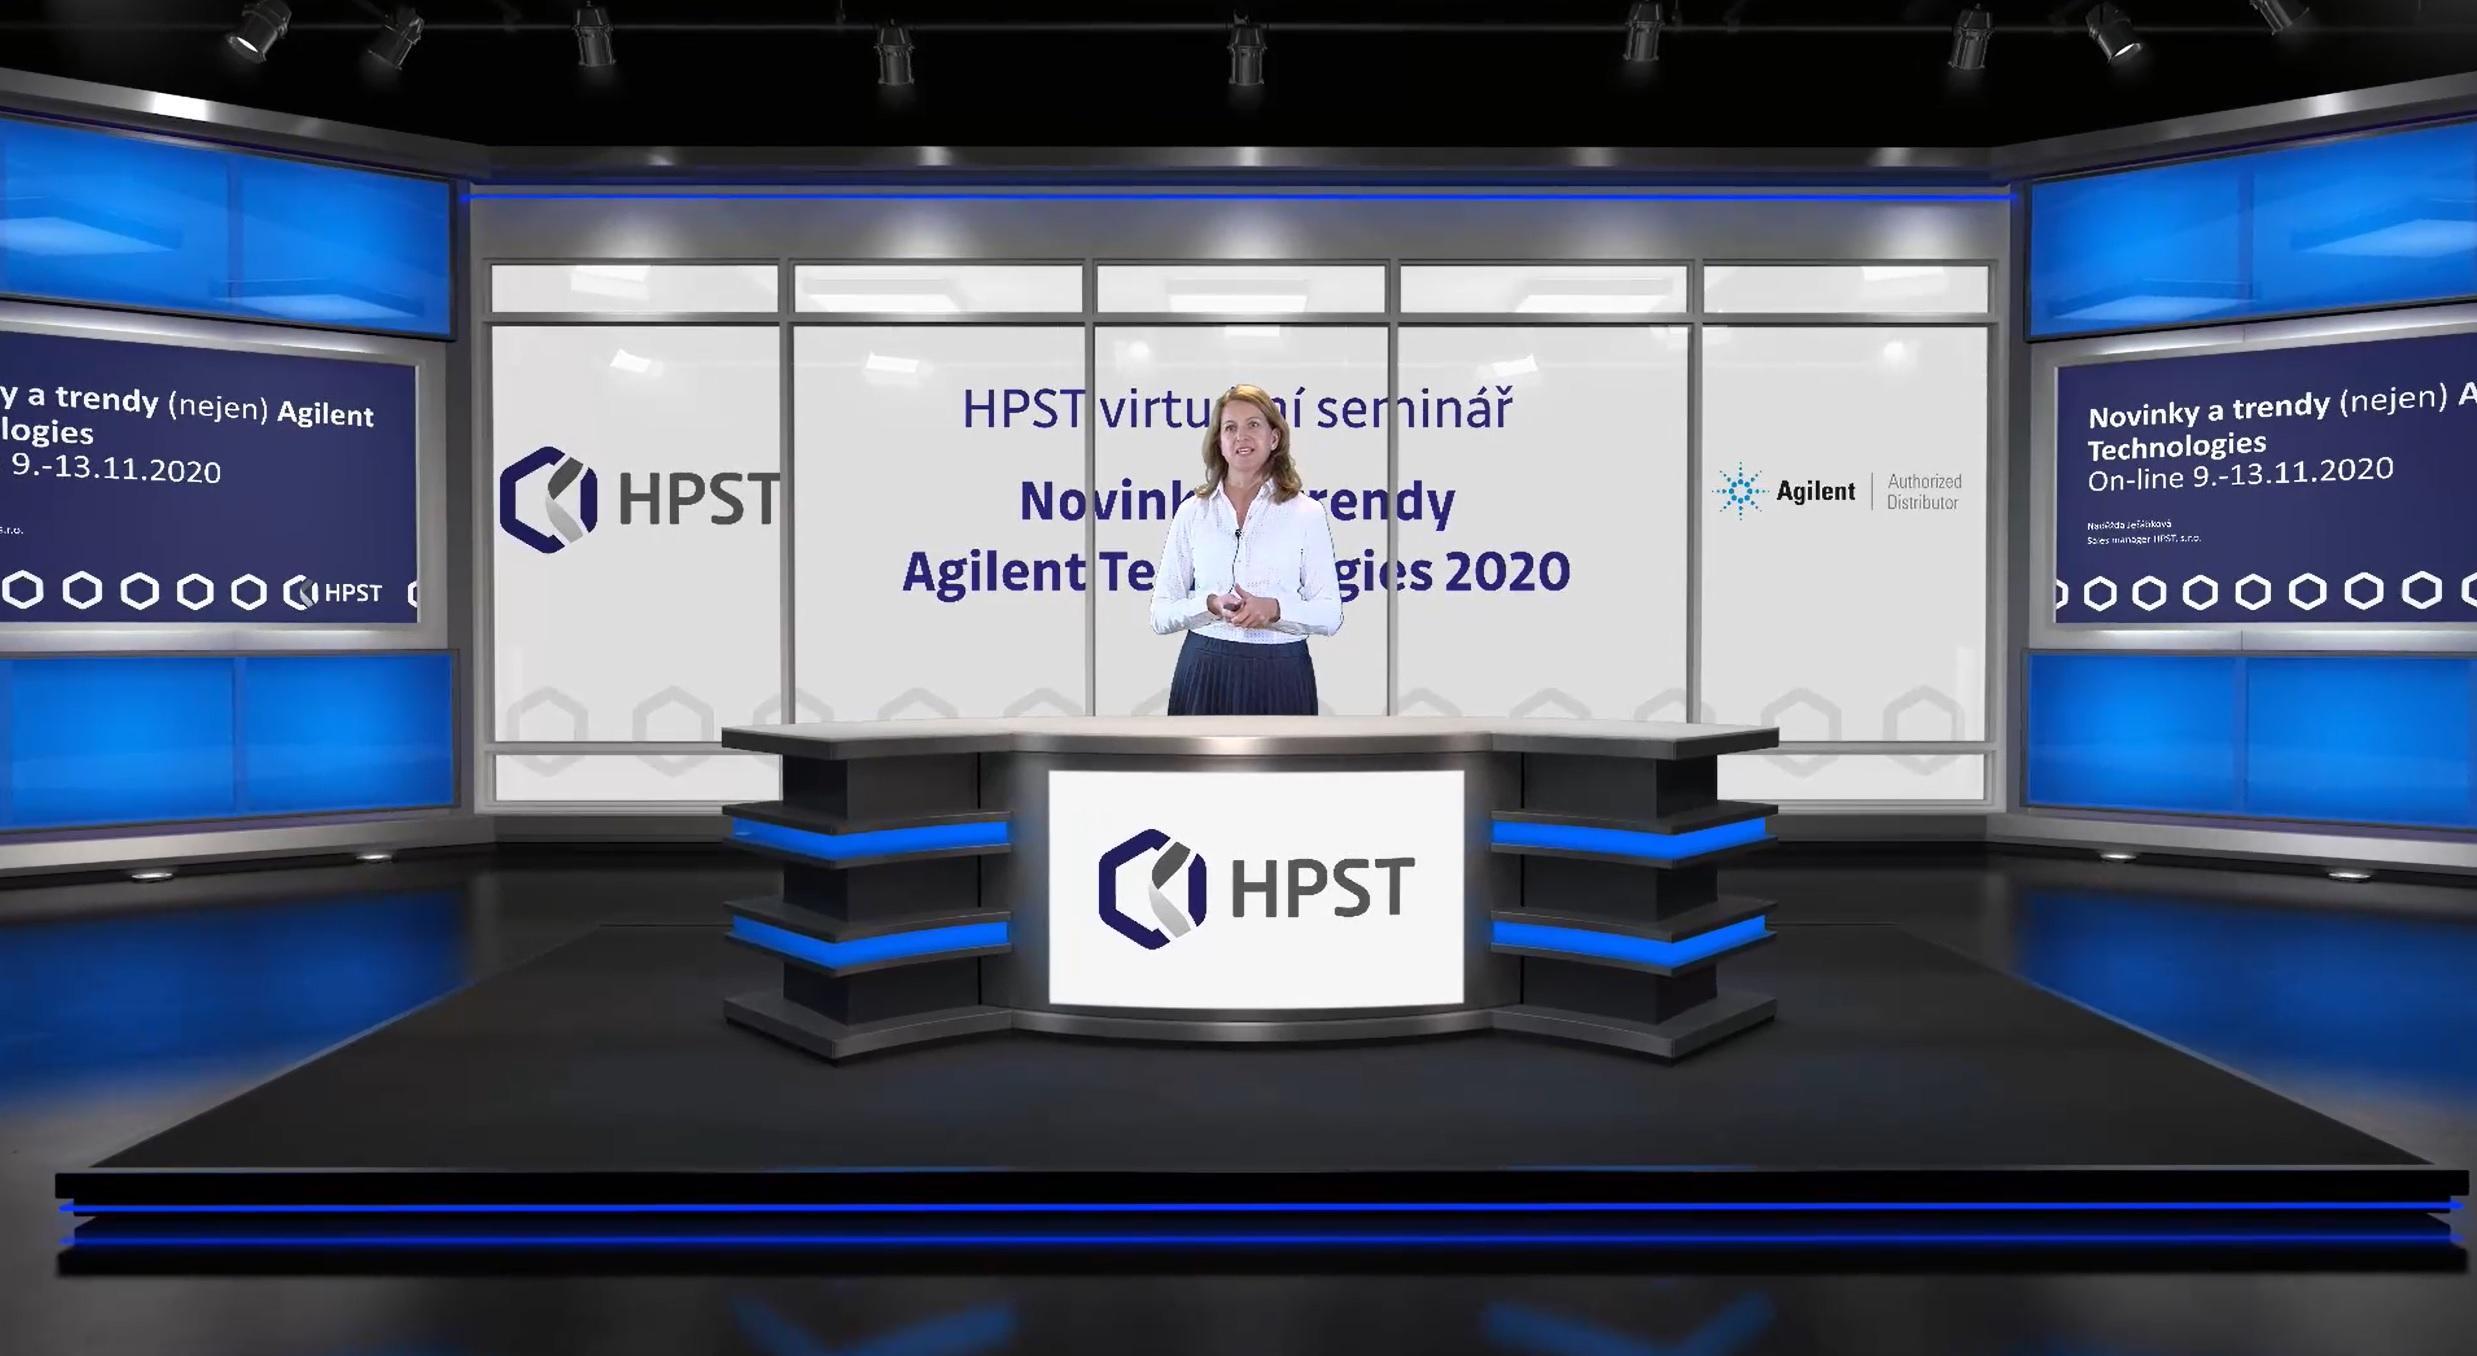 HPST: Novinky a trendy Agilent Technologies on-line